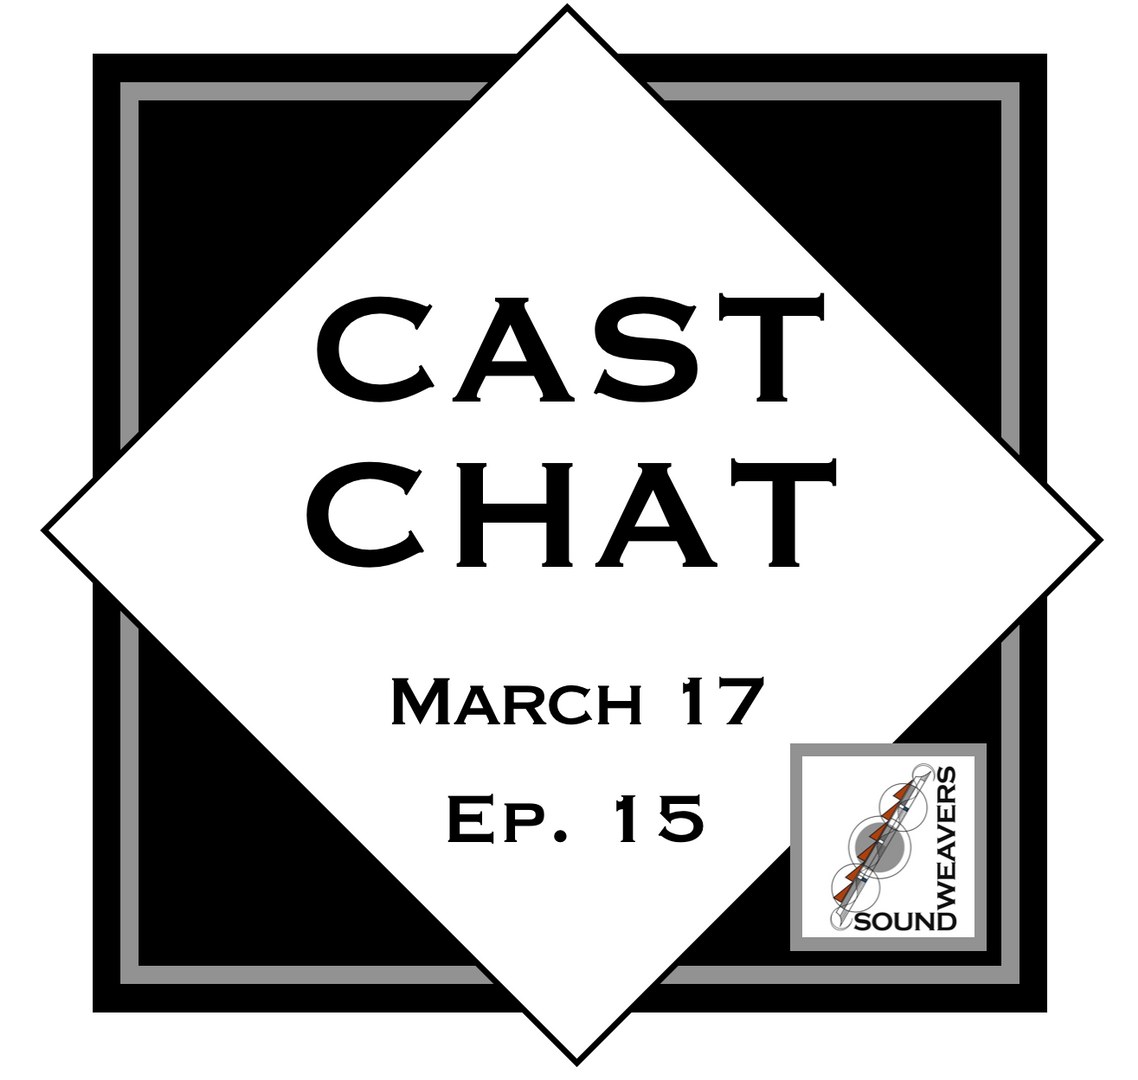 Cast Chat EP. 15